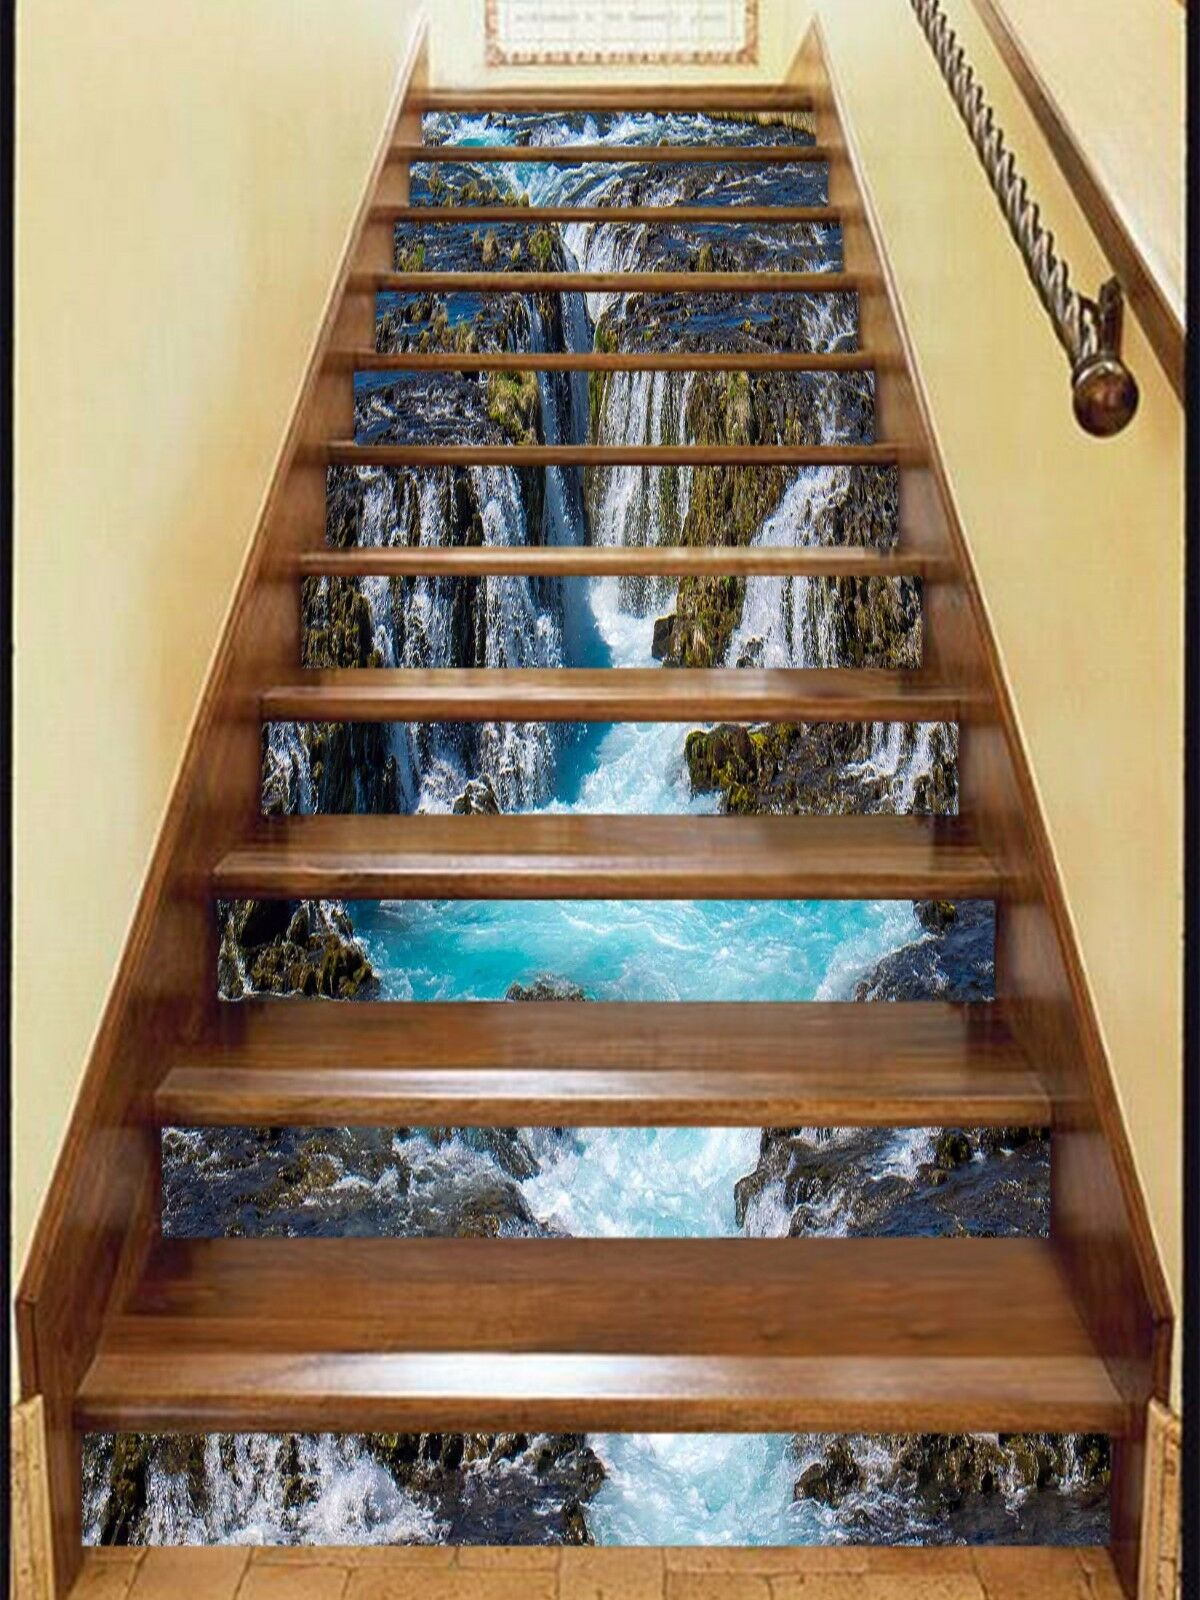 3D Landscape 68 Stair Risers Decoration Photo Mural Vinyl Decal Wallpaper UK